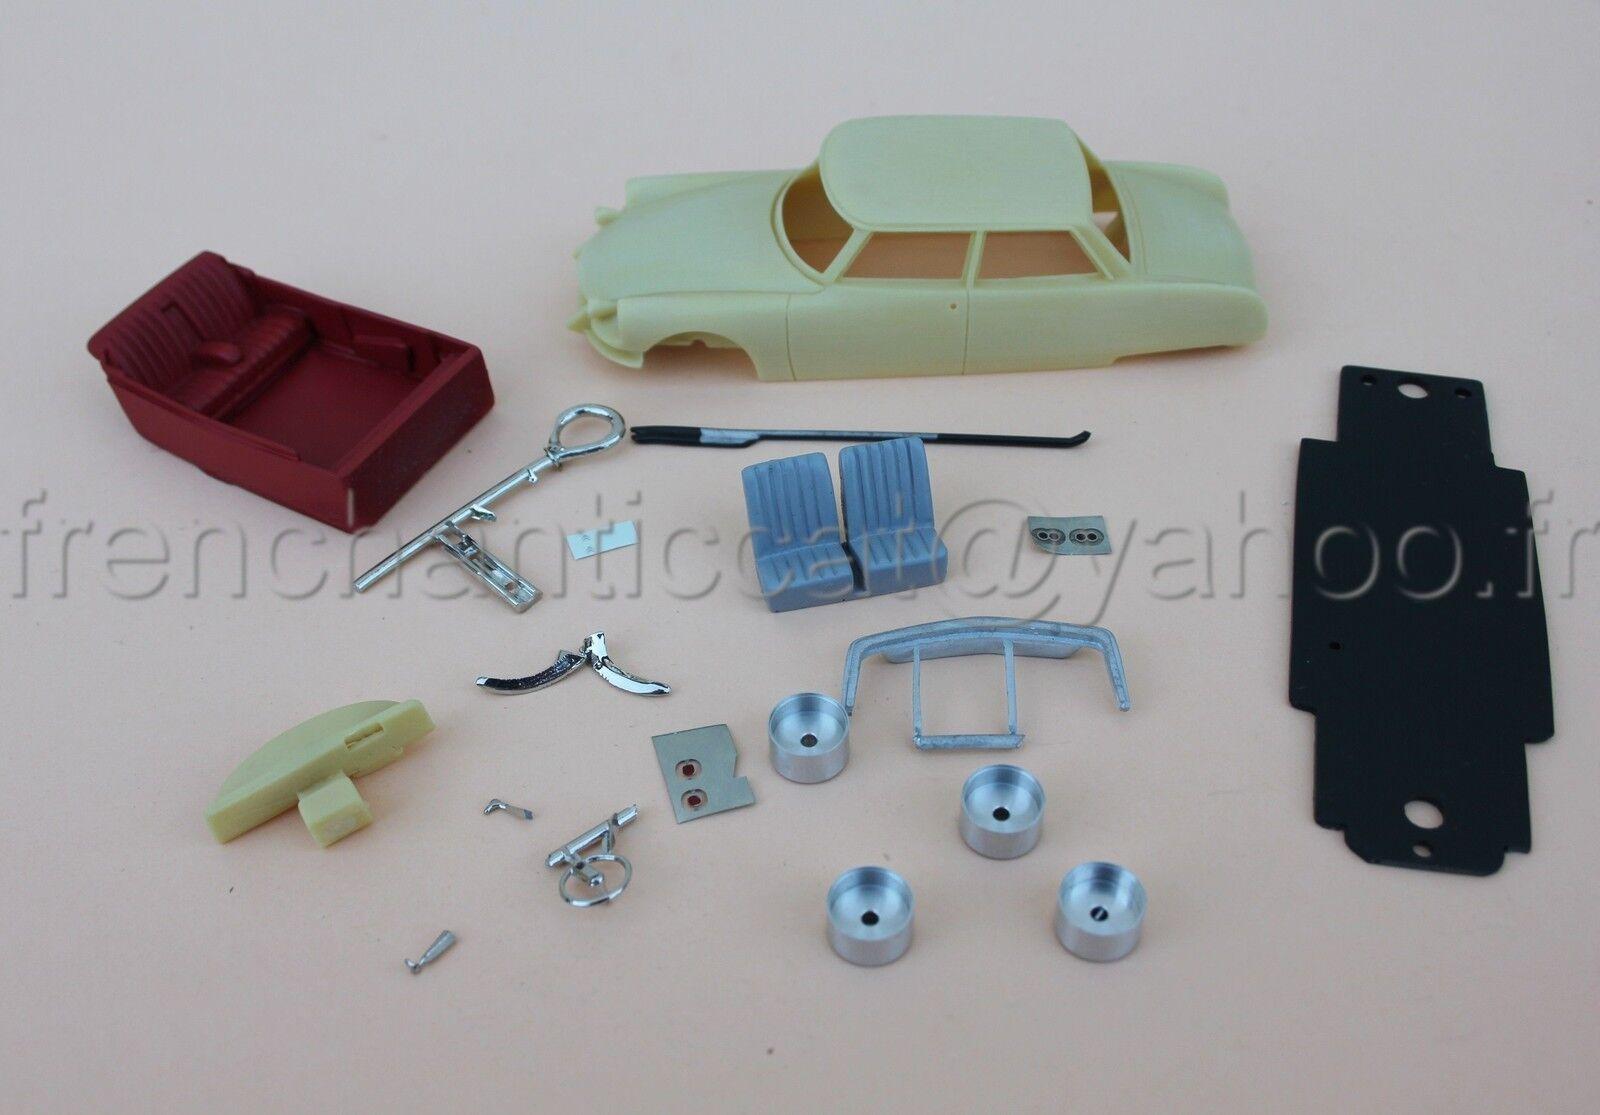 Iu Selten Car CITROËN Ds Chapron Le Dandy 1 43 Heco Miniaturen Harz Deko